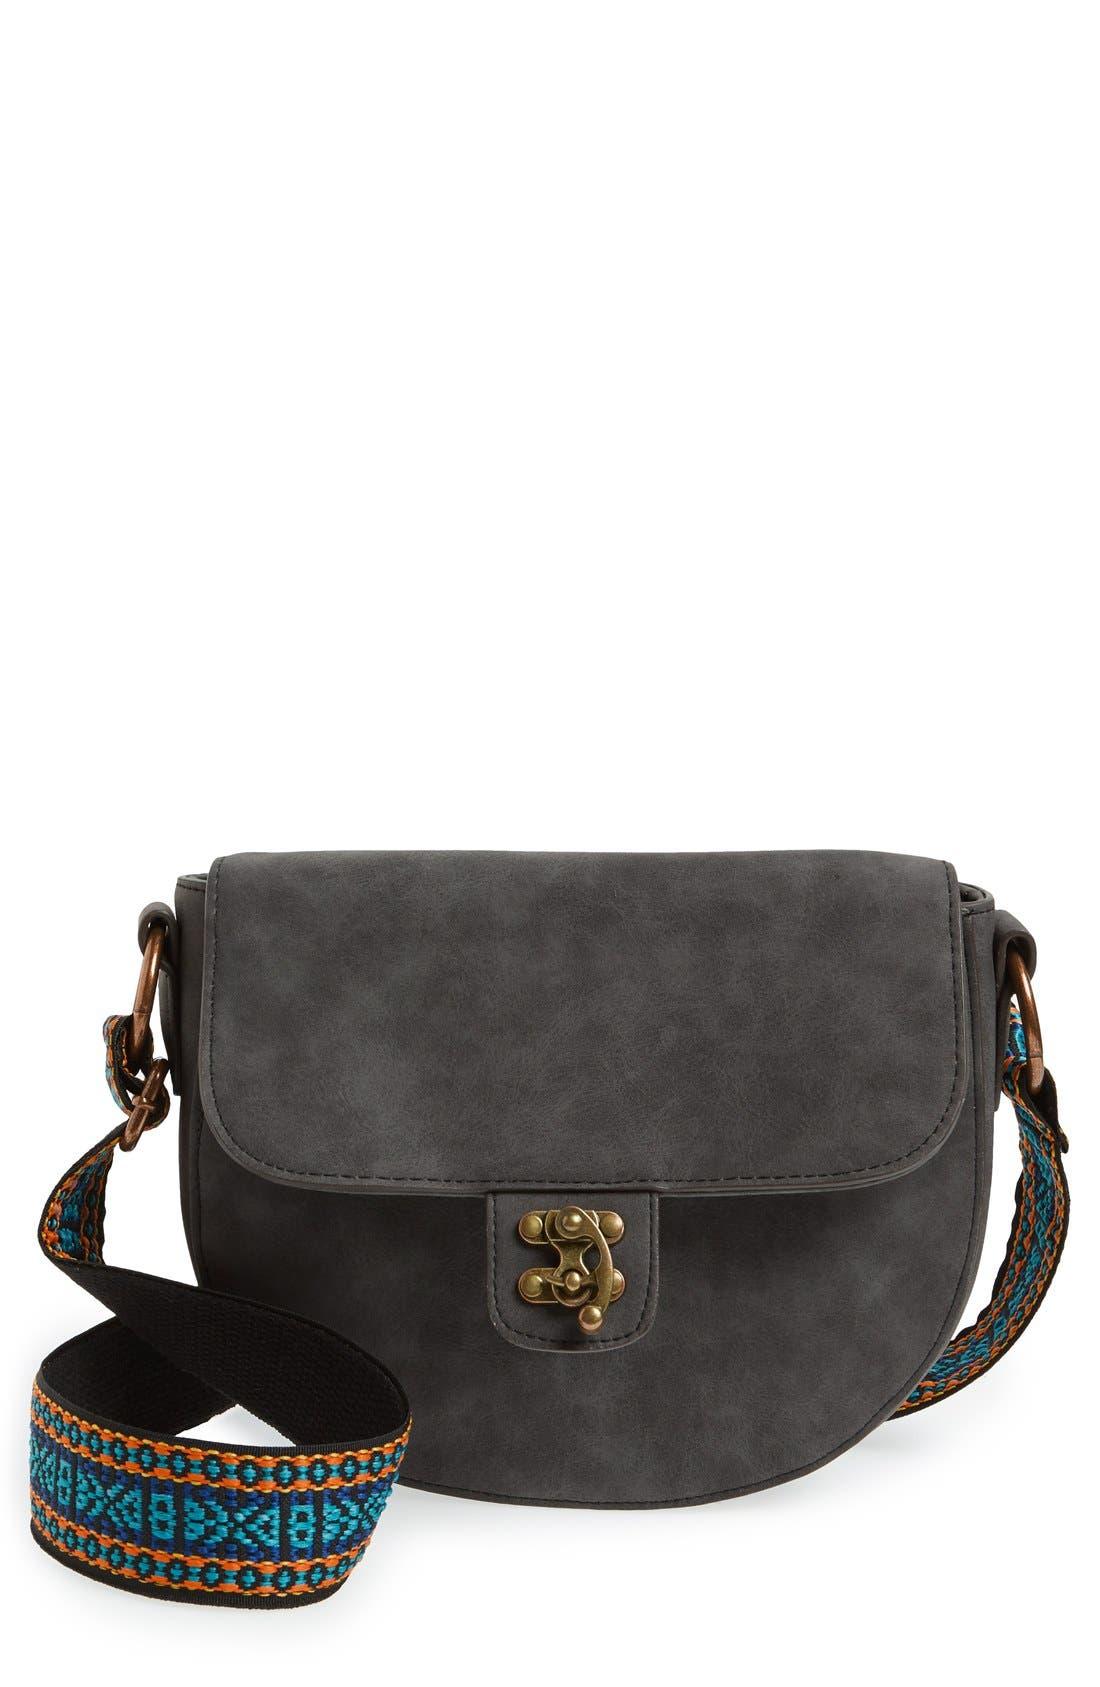 Main Image - Elle & Jae Gypset 'Marrakesh' Faux Suede Crossbody Bag